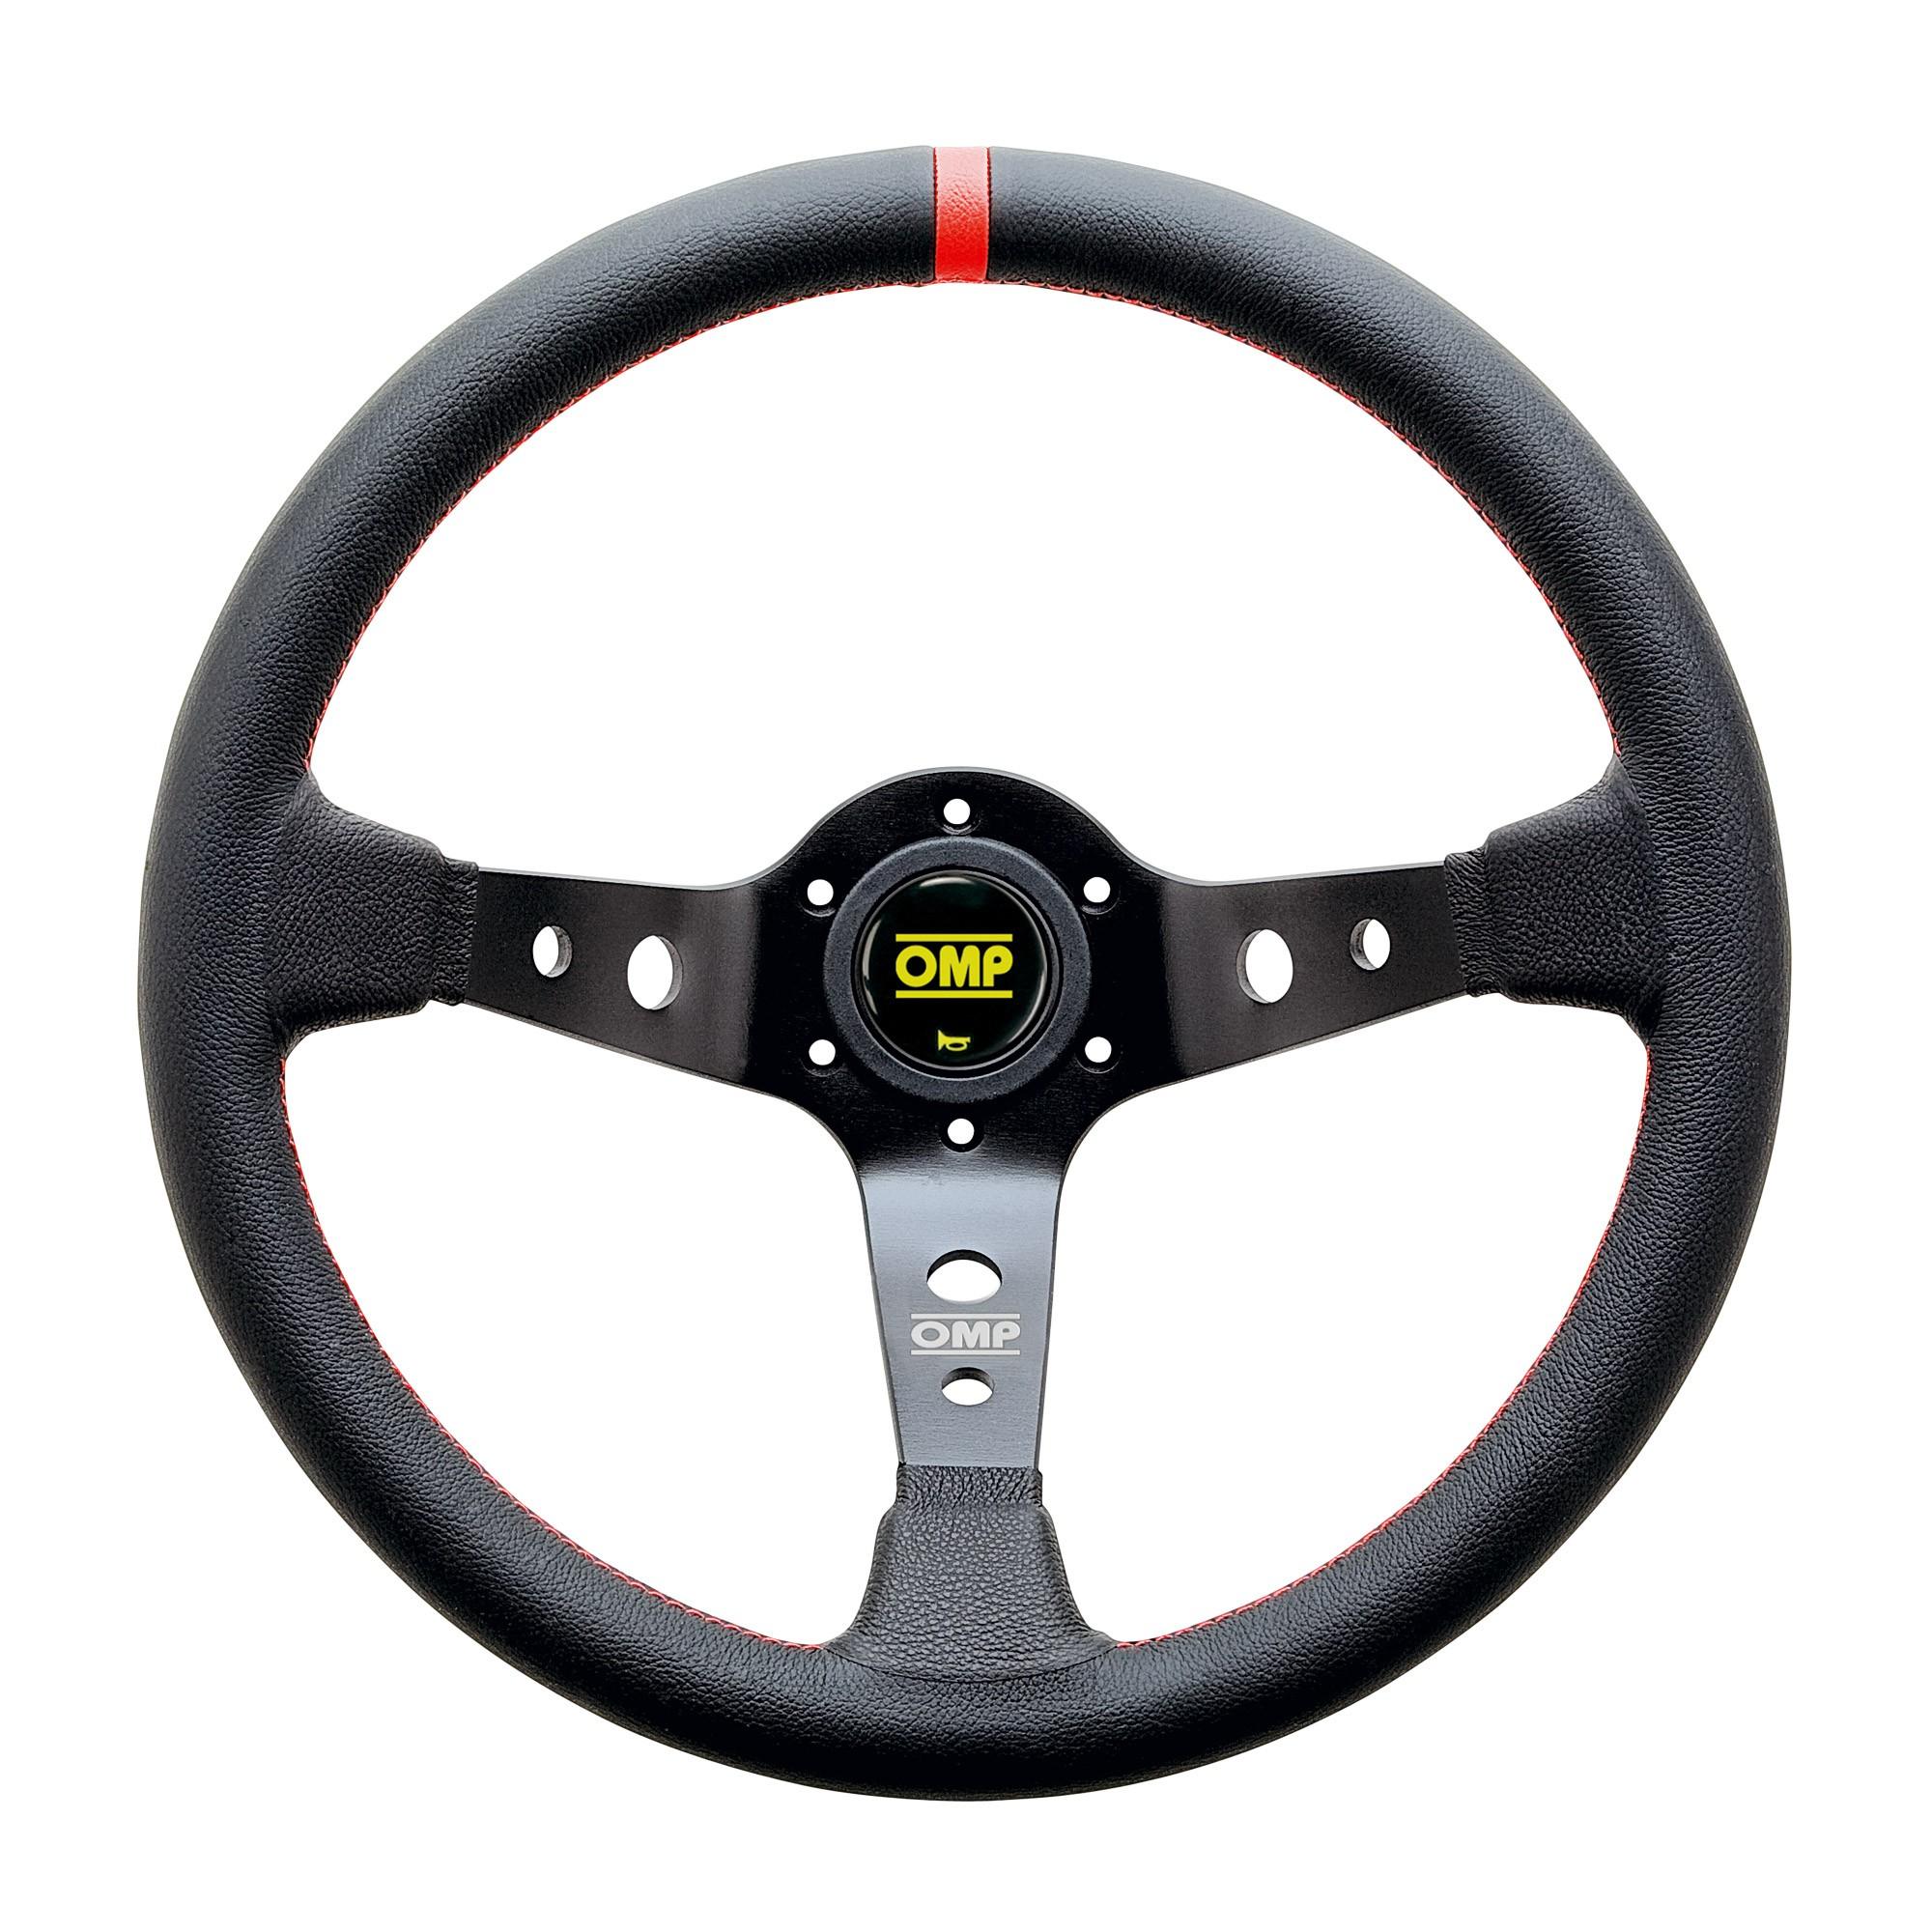 Kart, Racing and Rally Accessories | OMP Racing